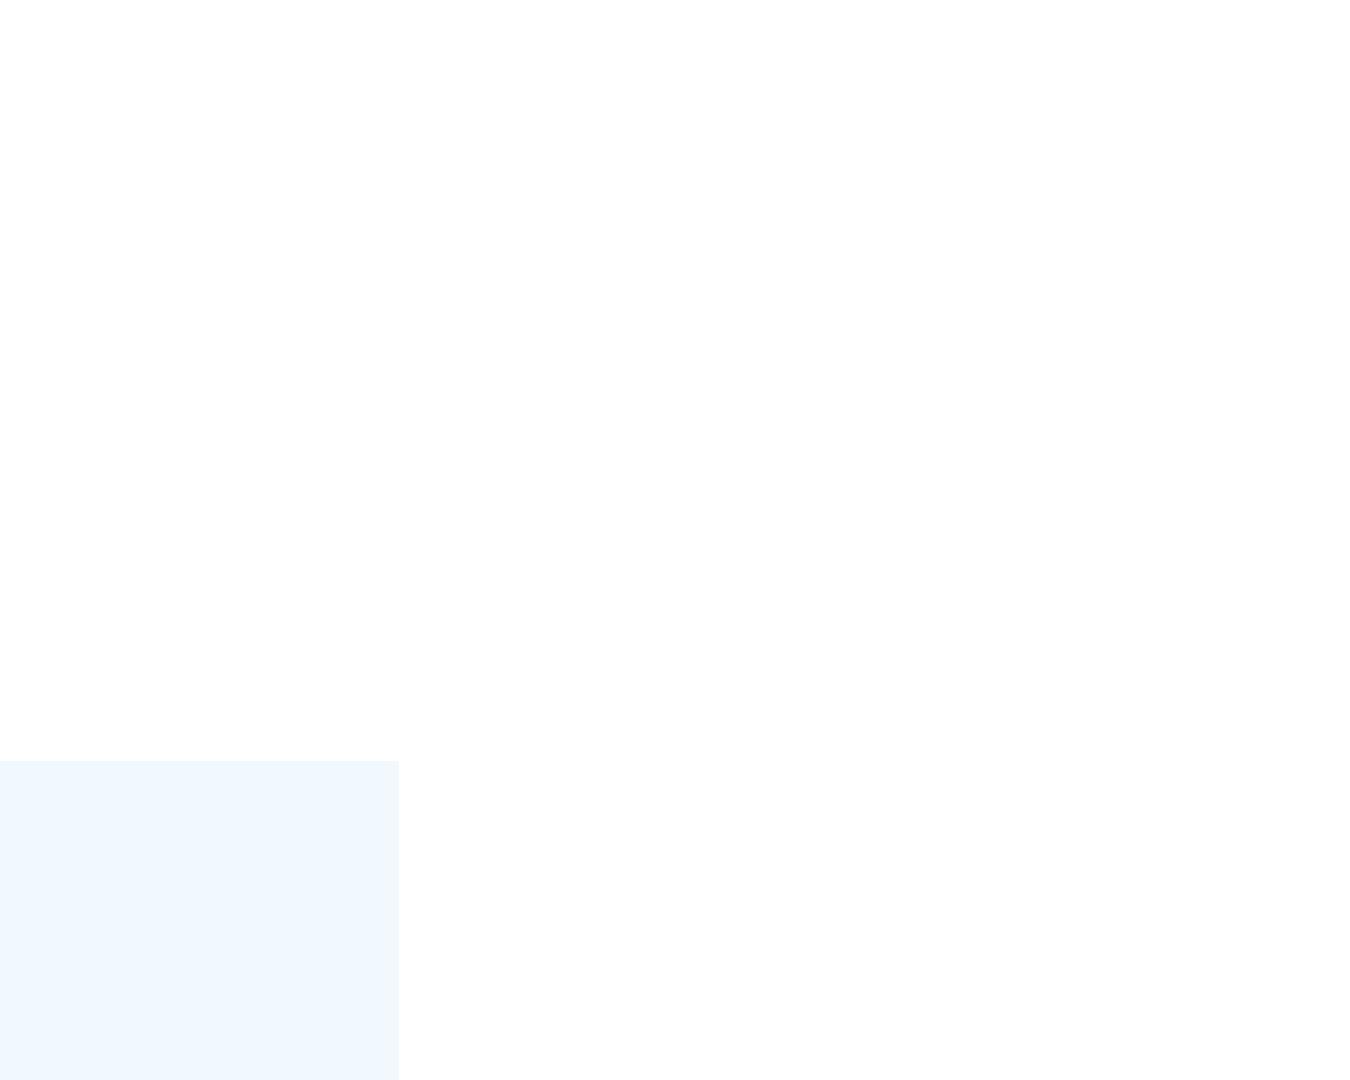 Light-blue-block-sm-01